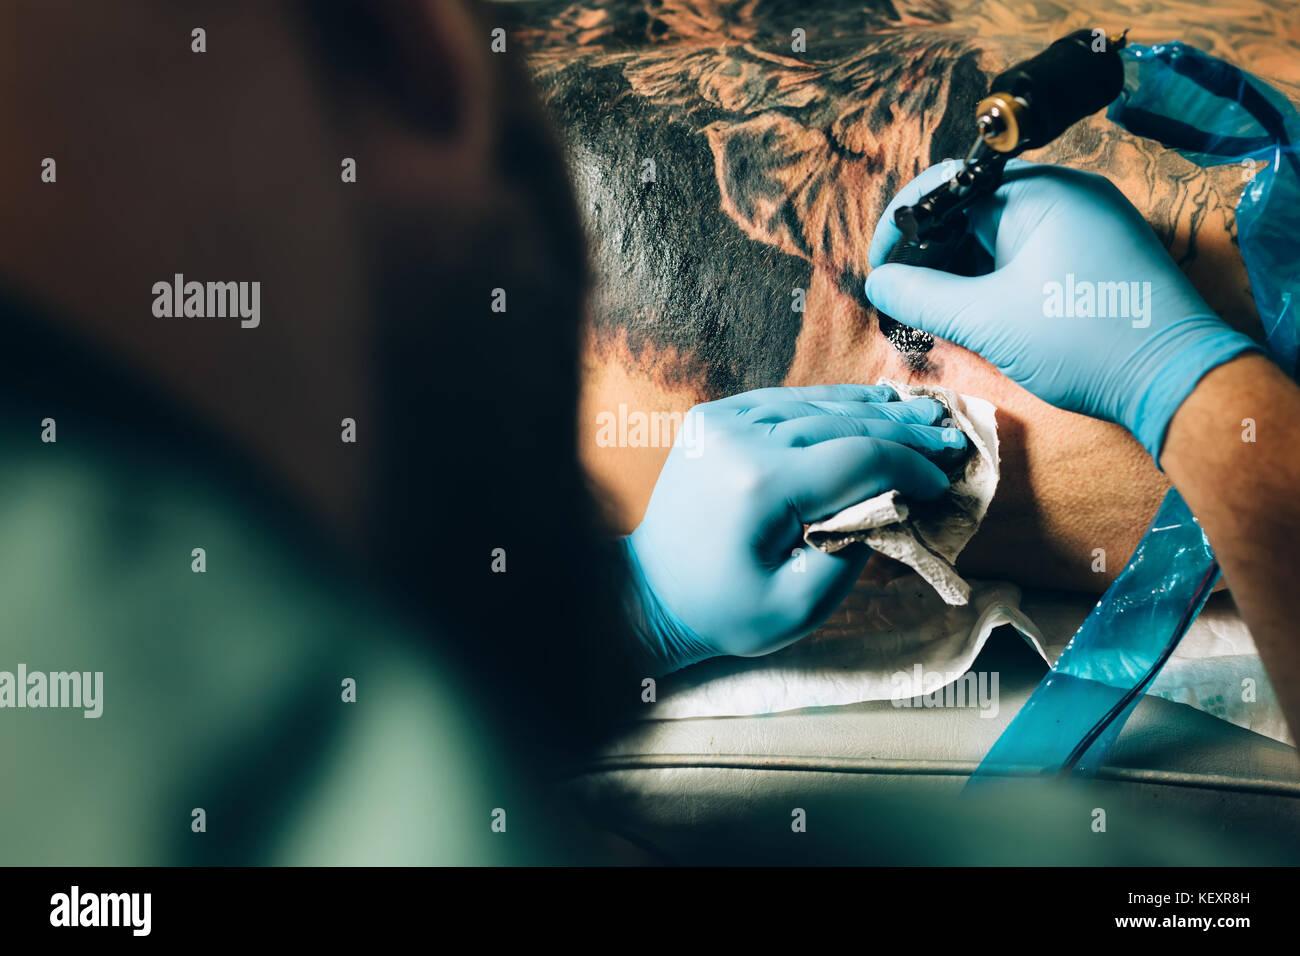 tattoo master artist makes a tattoo. Closeup - Stock Image